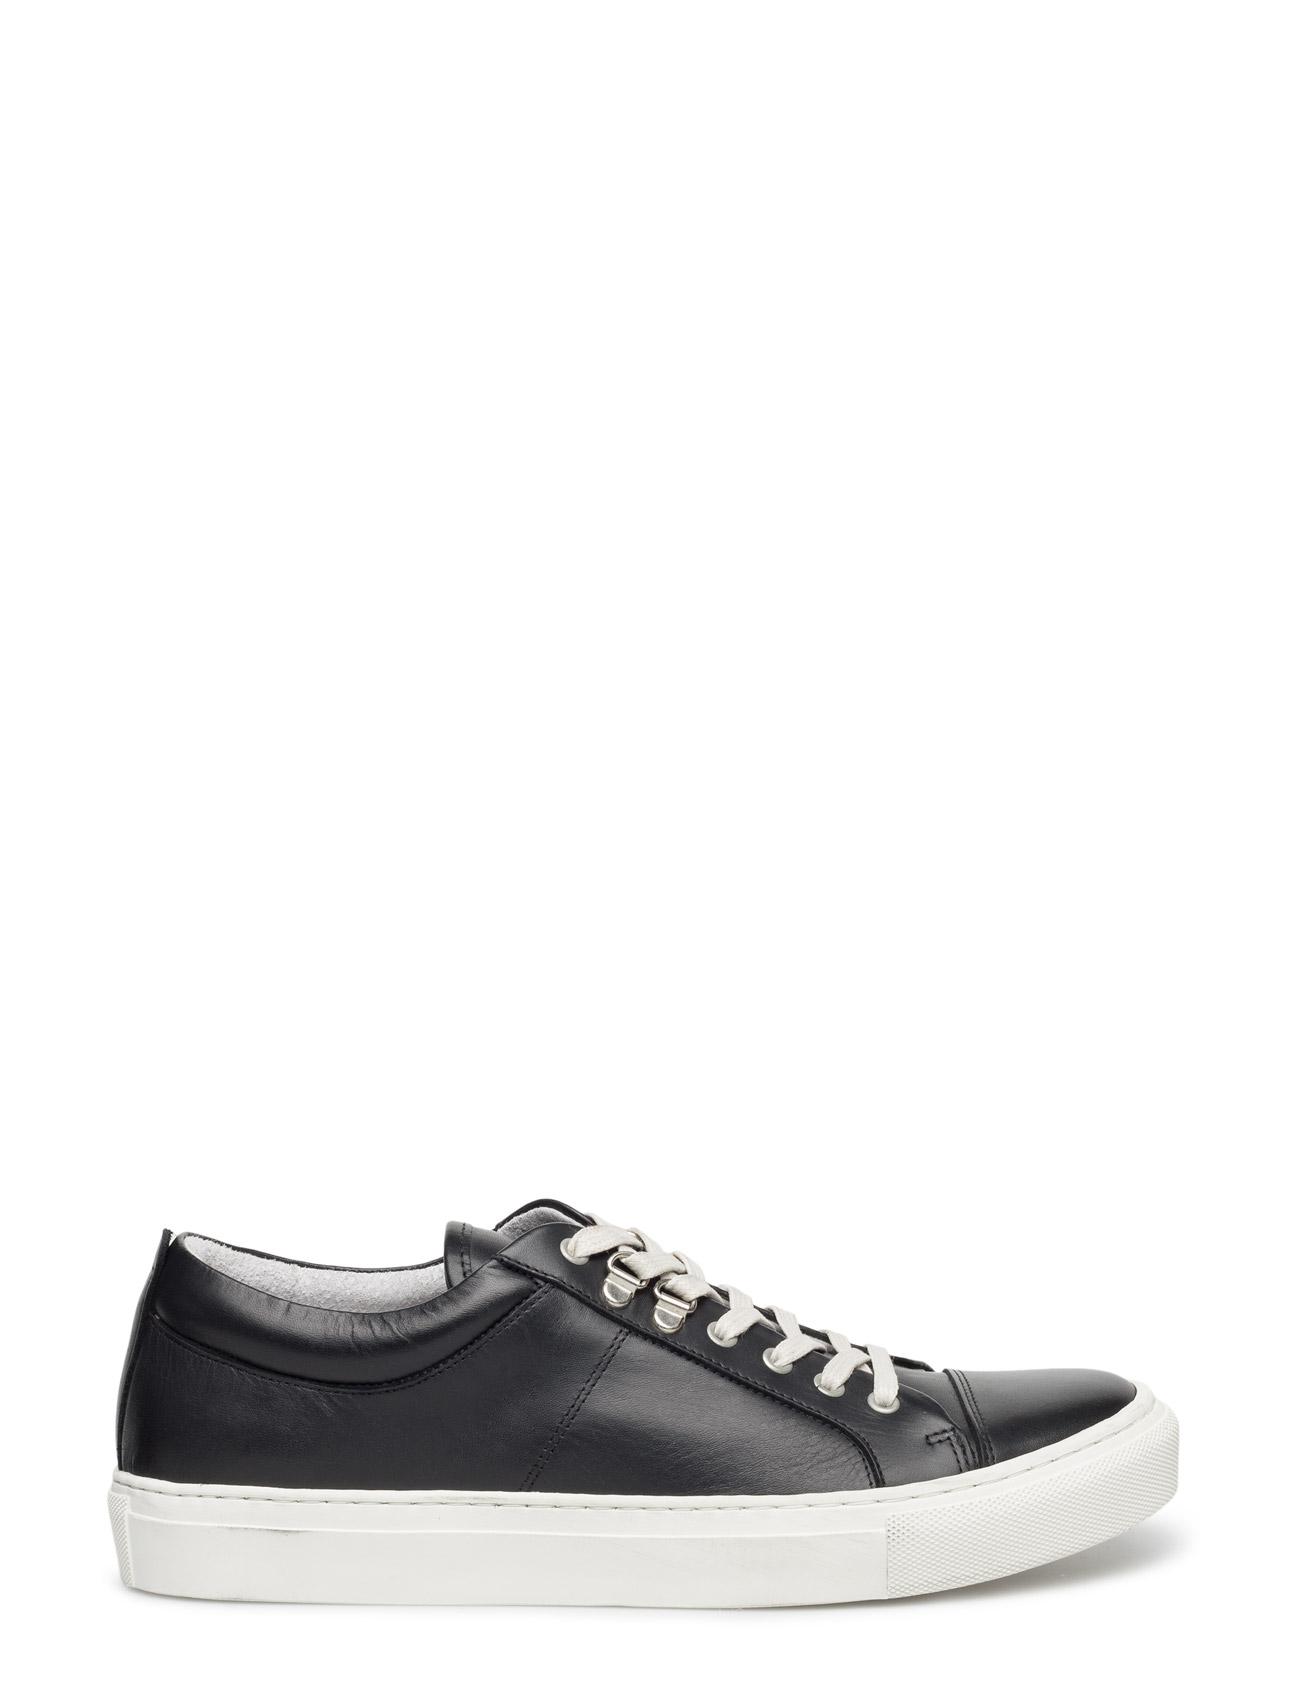 Sneakers, Mads Nørgaard Leather